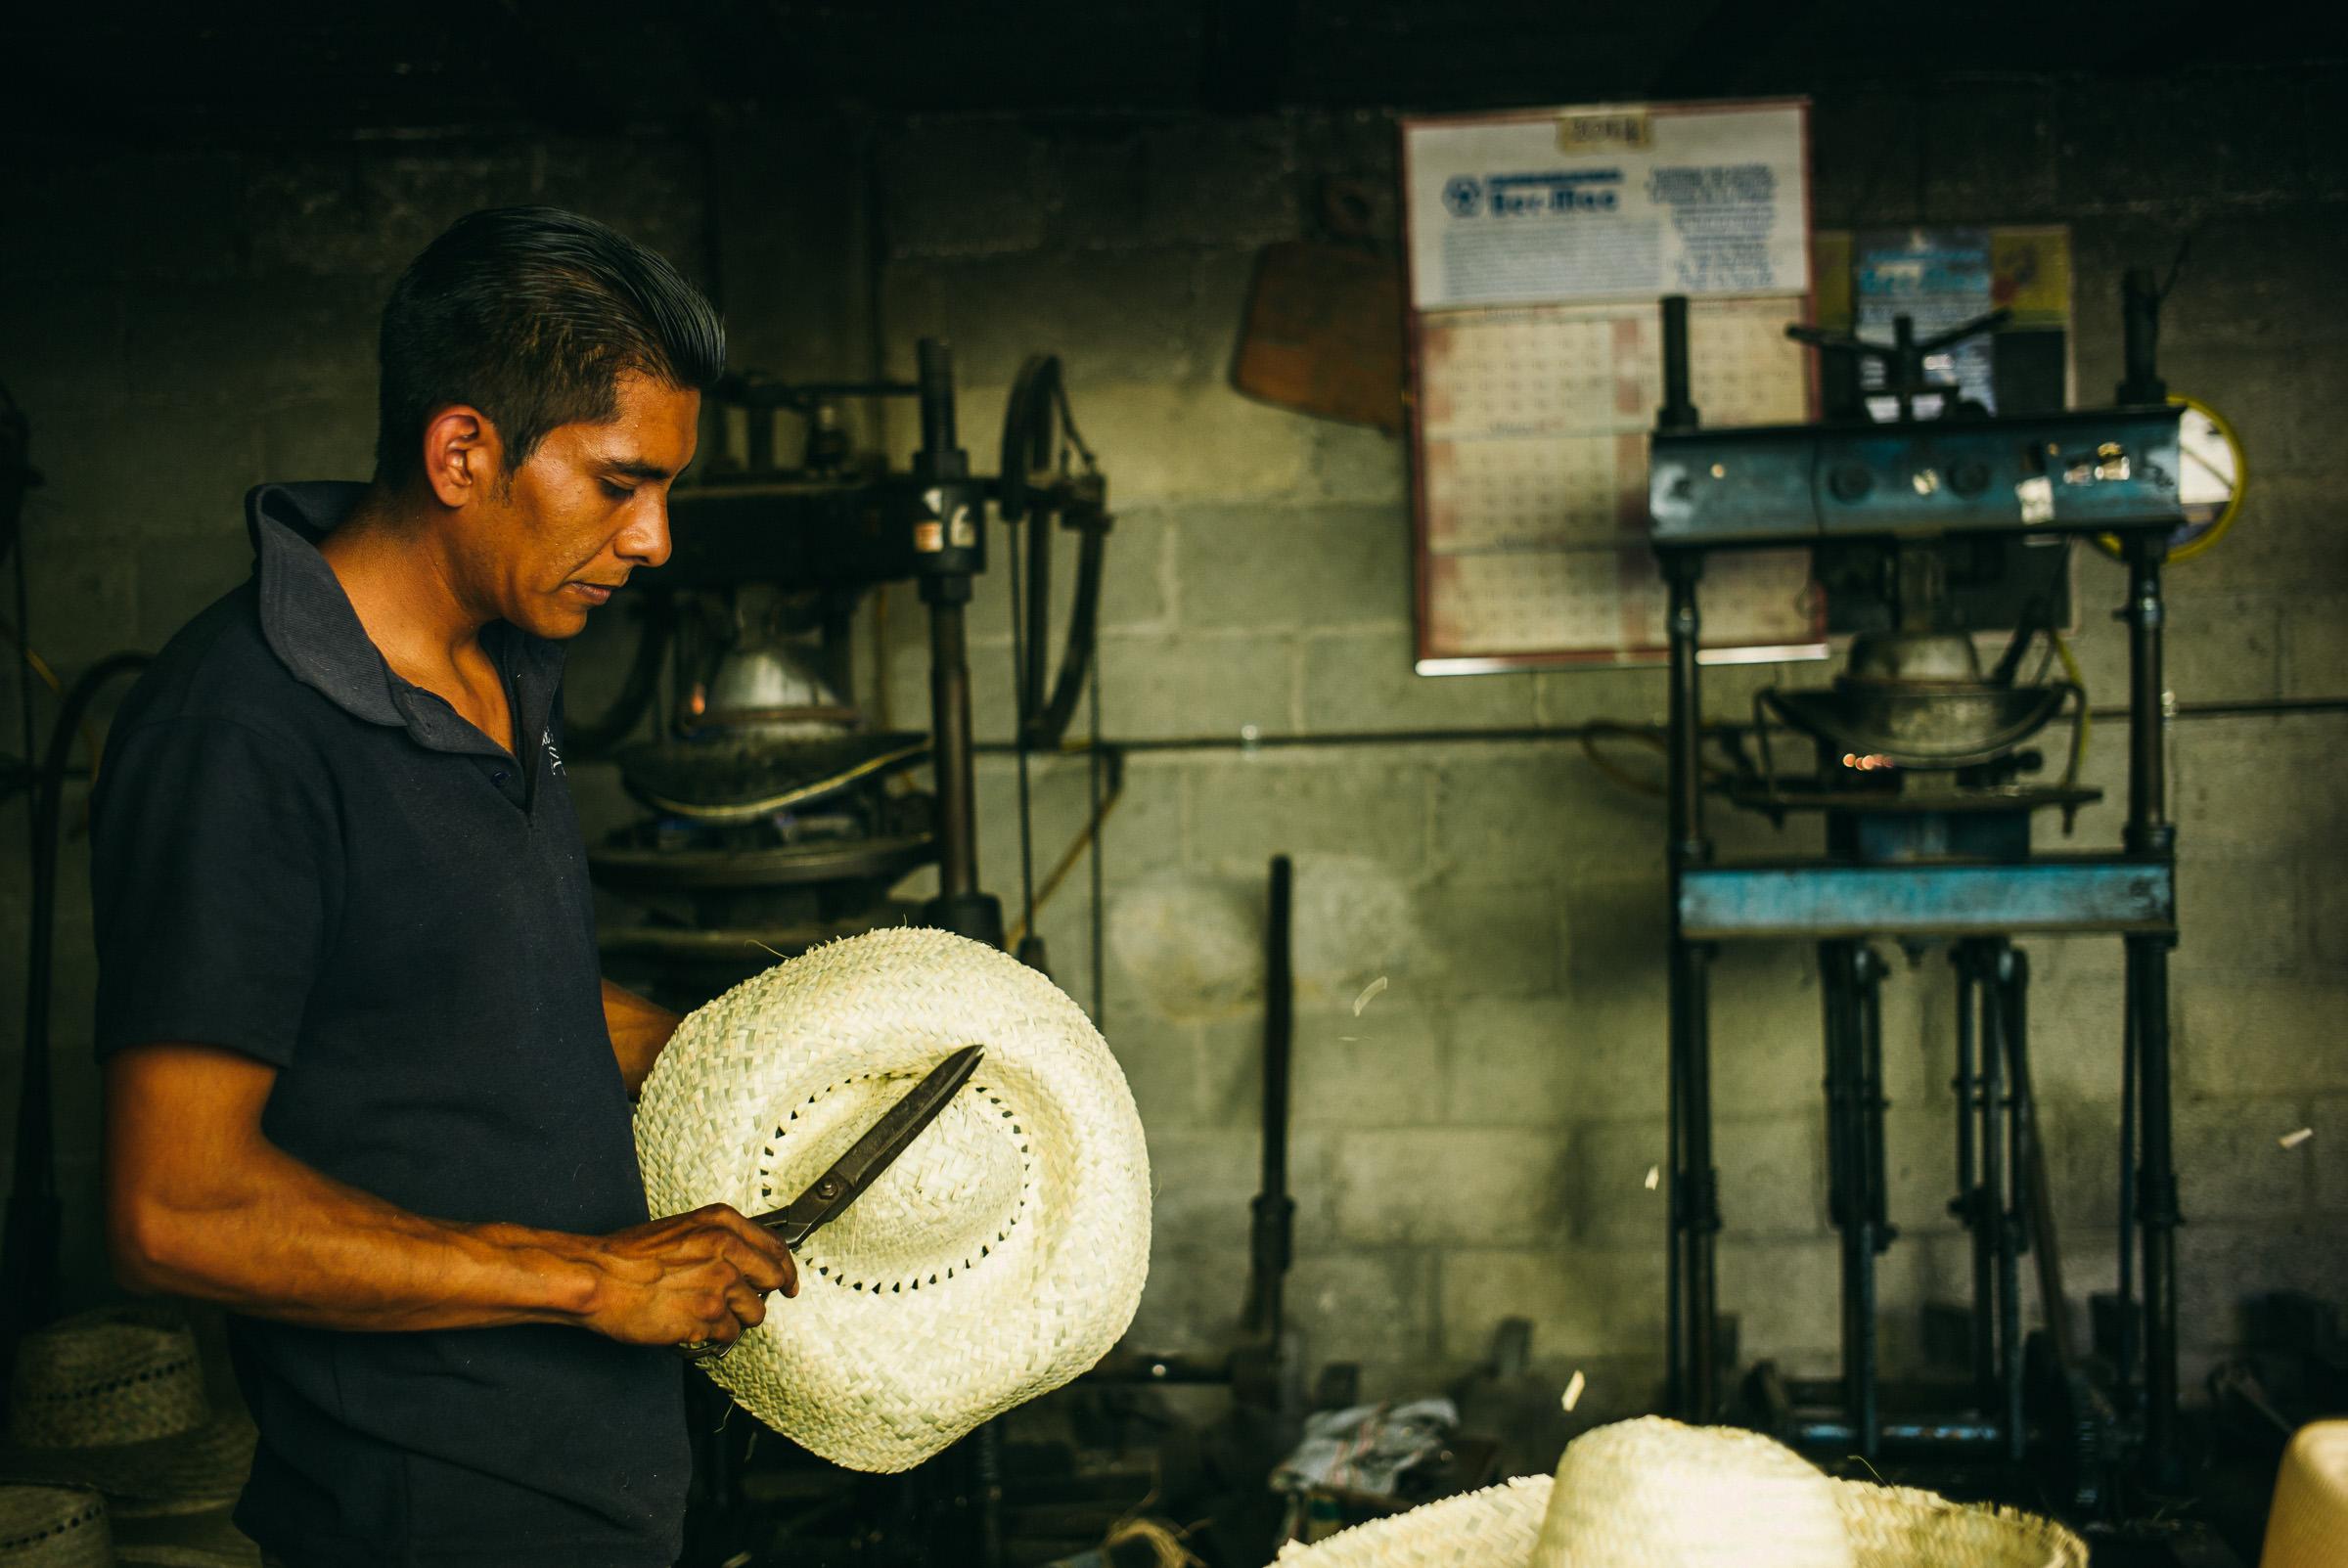 brandon_patoc_travel_photographer_in_mexico_0004.jpg